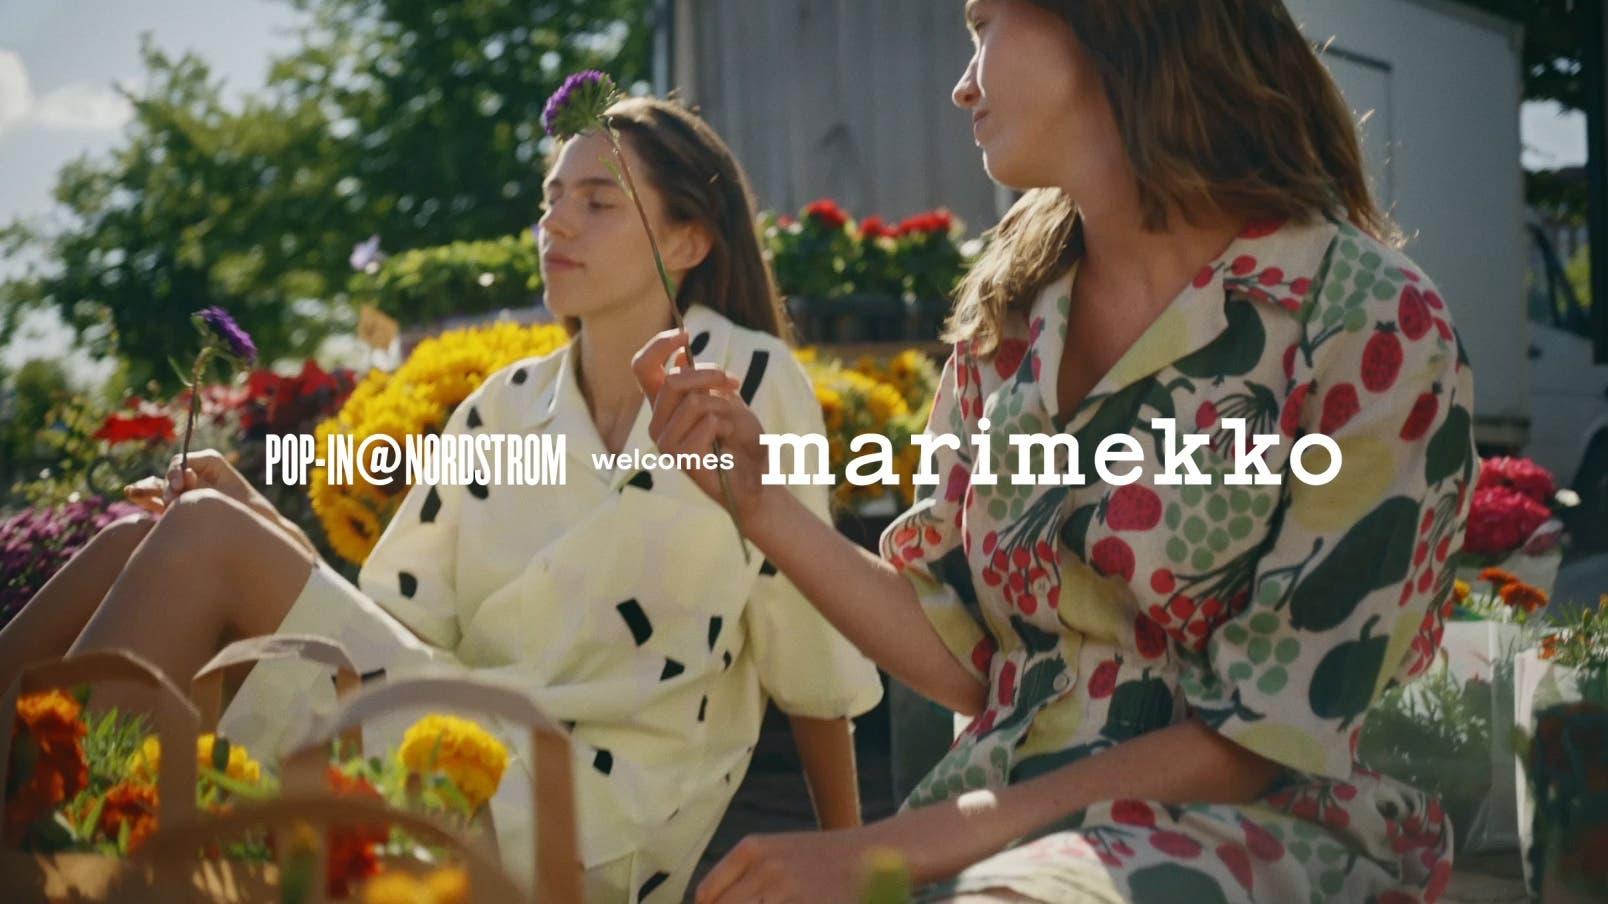 Women wearing printed Marimekko outfits.